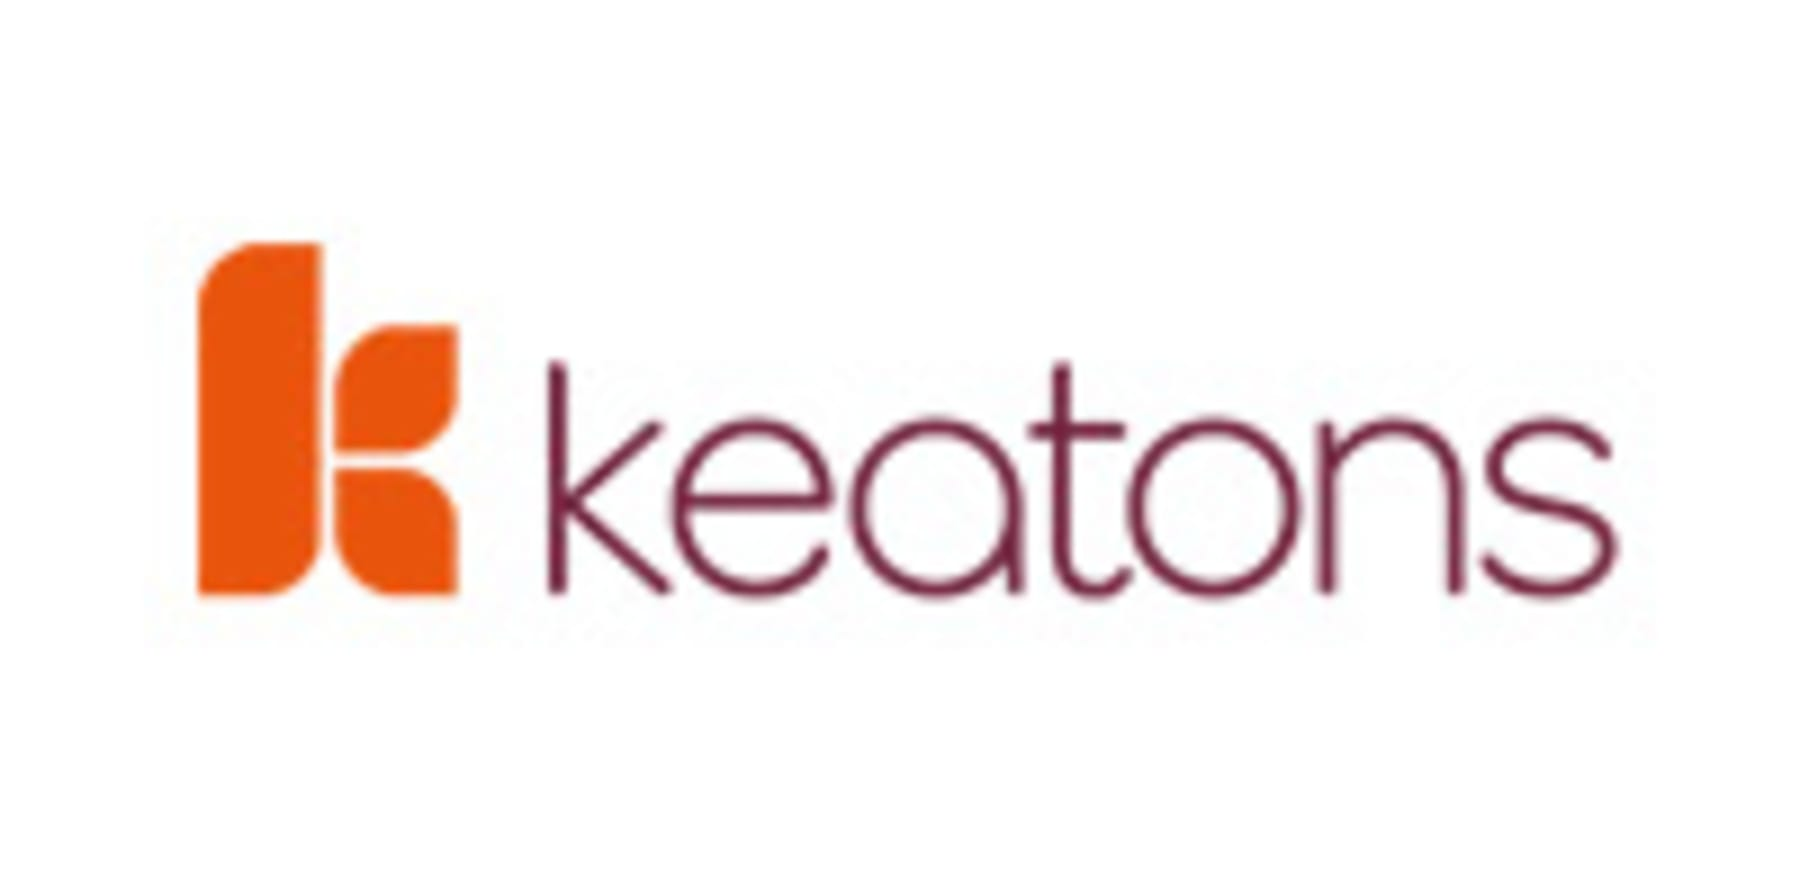 Keatons Estate Agents